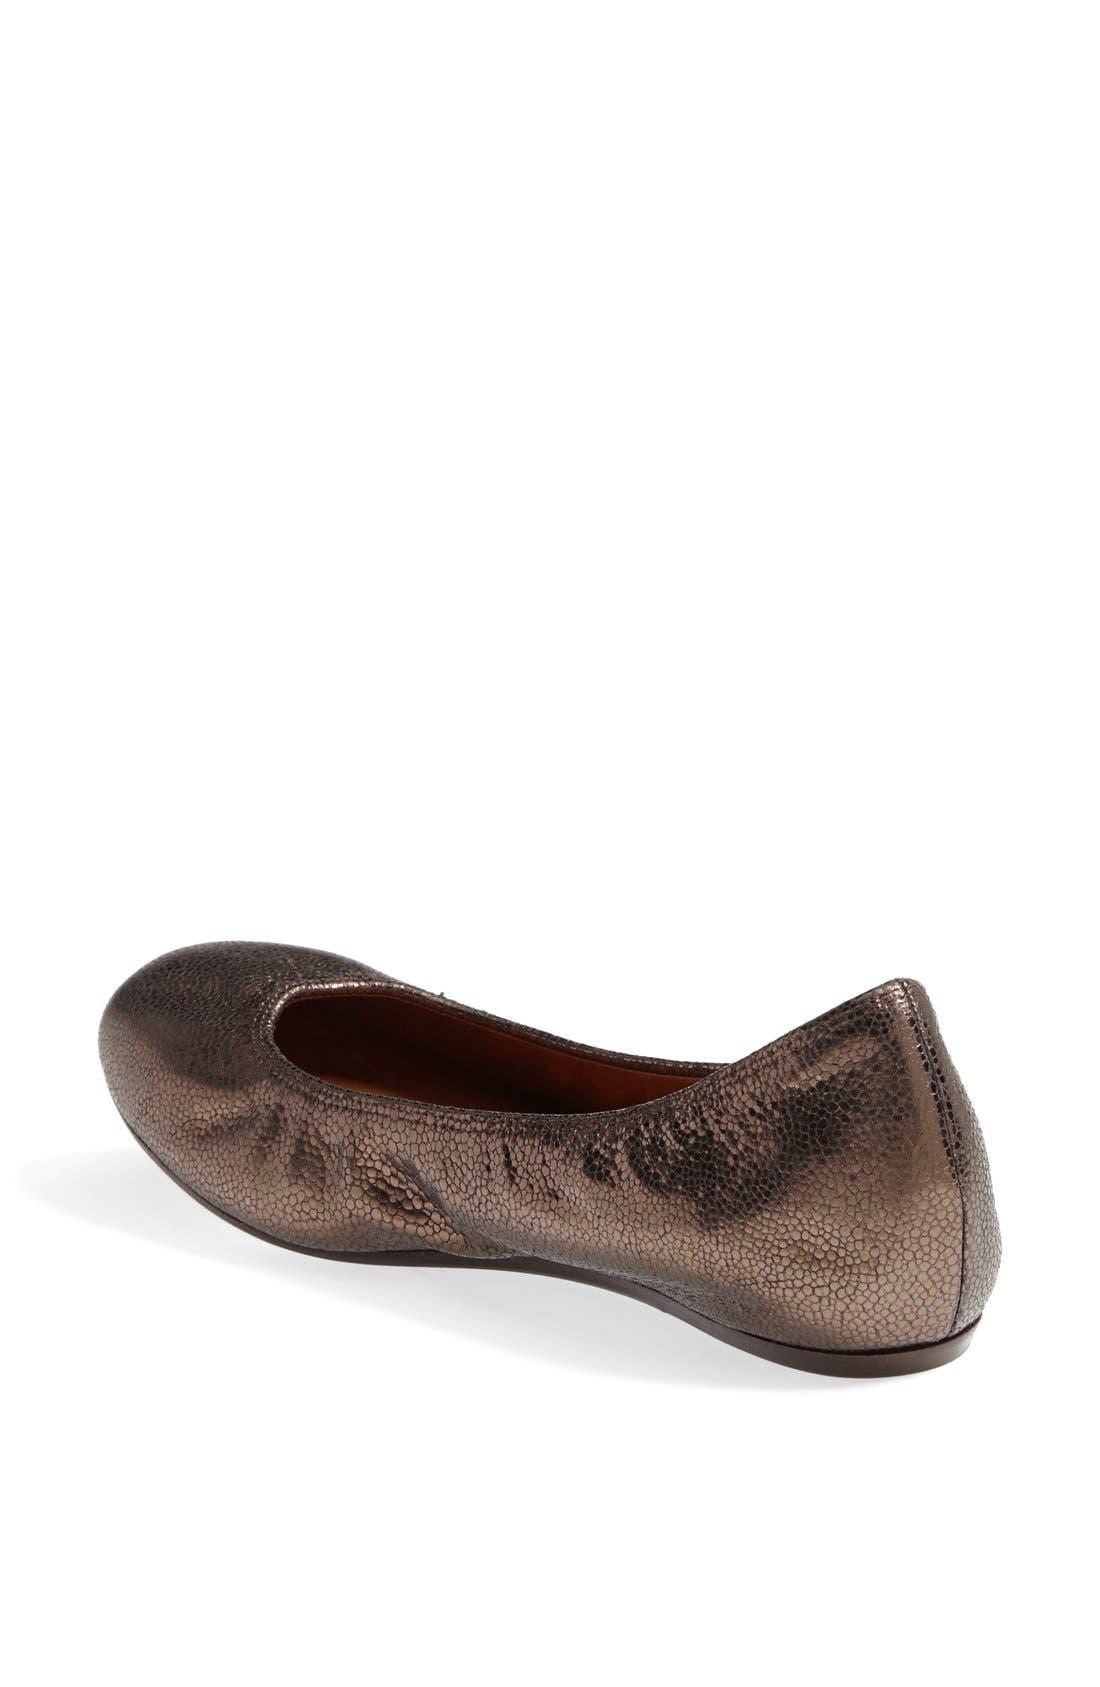 Alternate Image 2  - Lanvin Metallic Leather Ballerina Flat (Women)